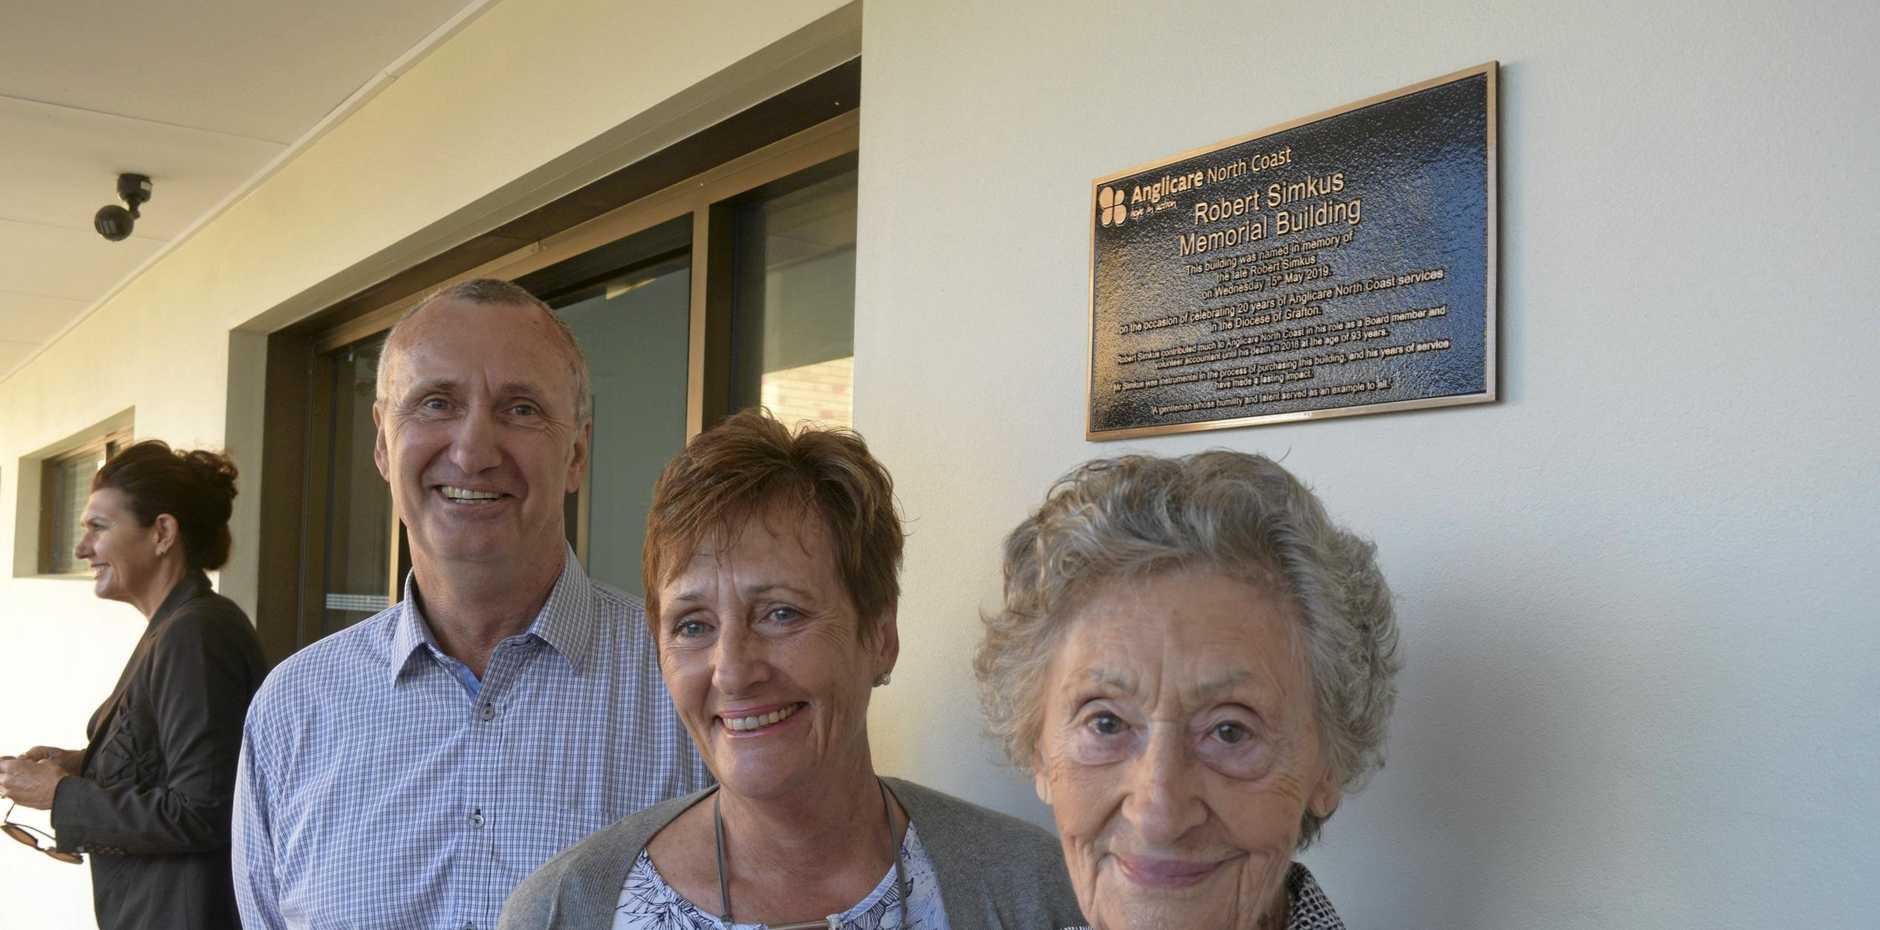 Robert Simkus's wife Merle with son Geoffrey Simkus and daughter Rose Morrow.